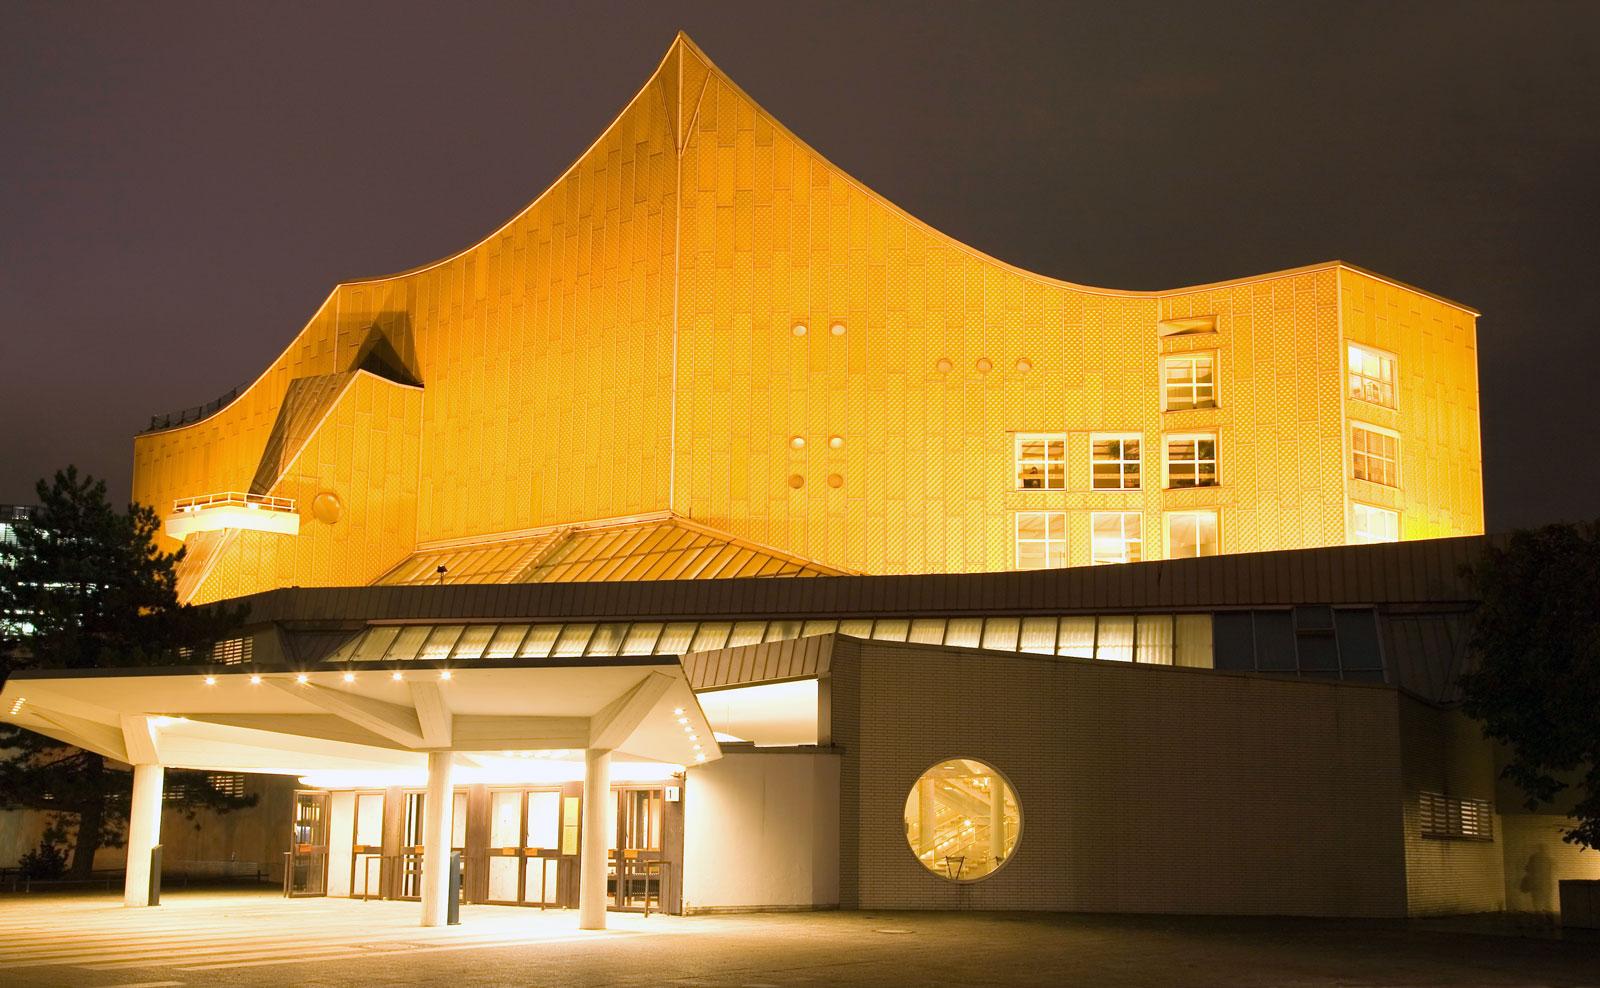 Philharmonie, Potsdamer Platz, Berlin: architect Hans Scharoun